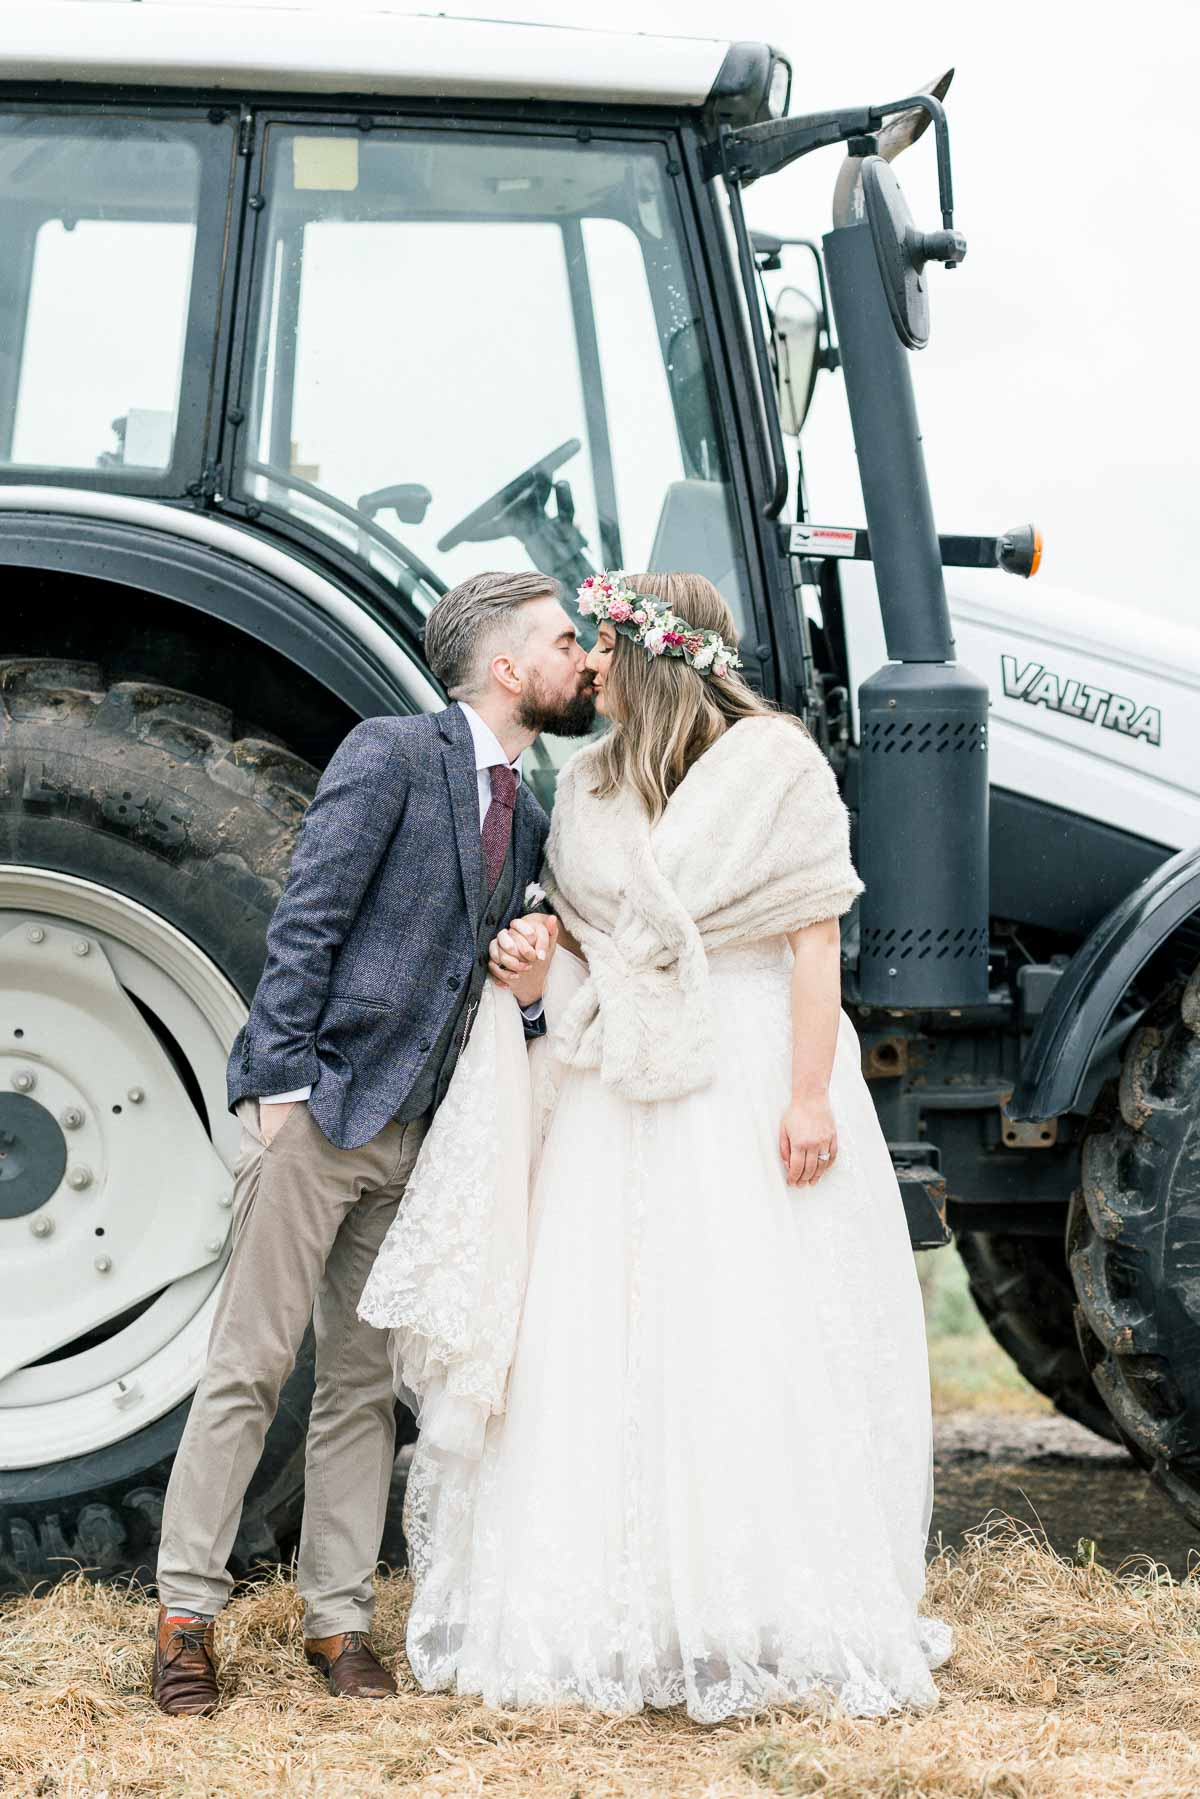 adams-farm-coldstream-yarra-valley-wedding-heart+soul-weddings-kel-jarryd-05664.jpg